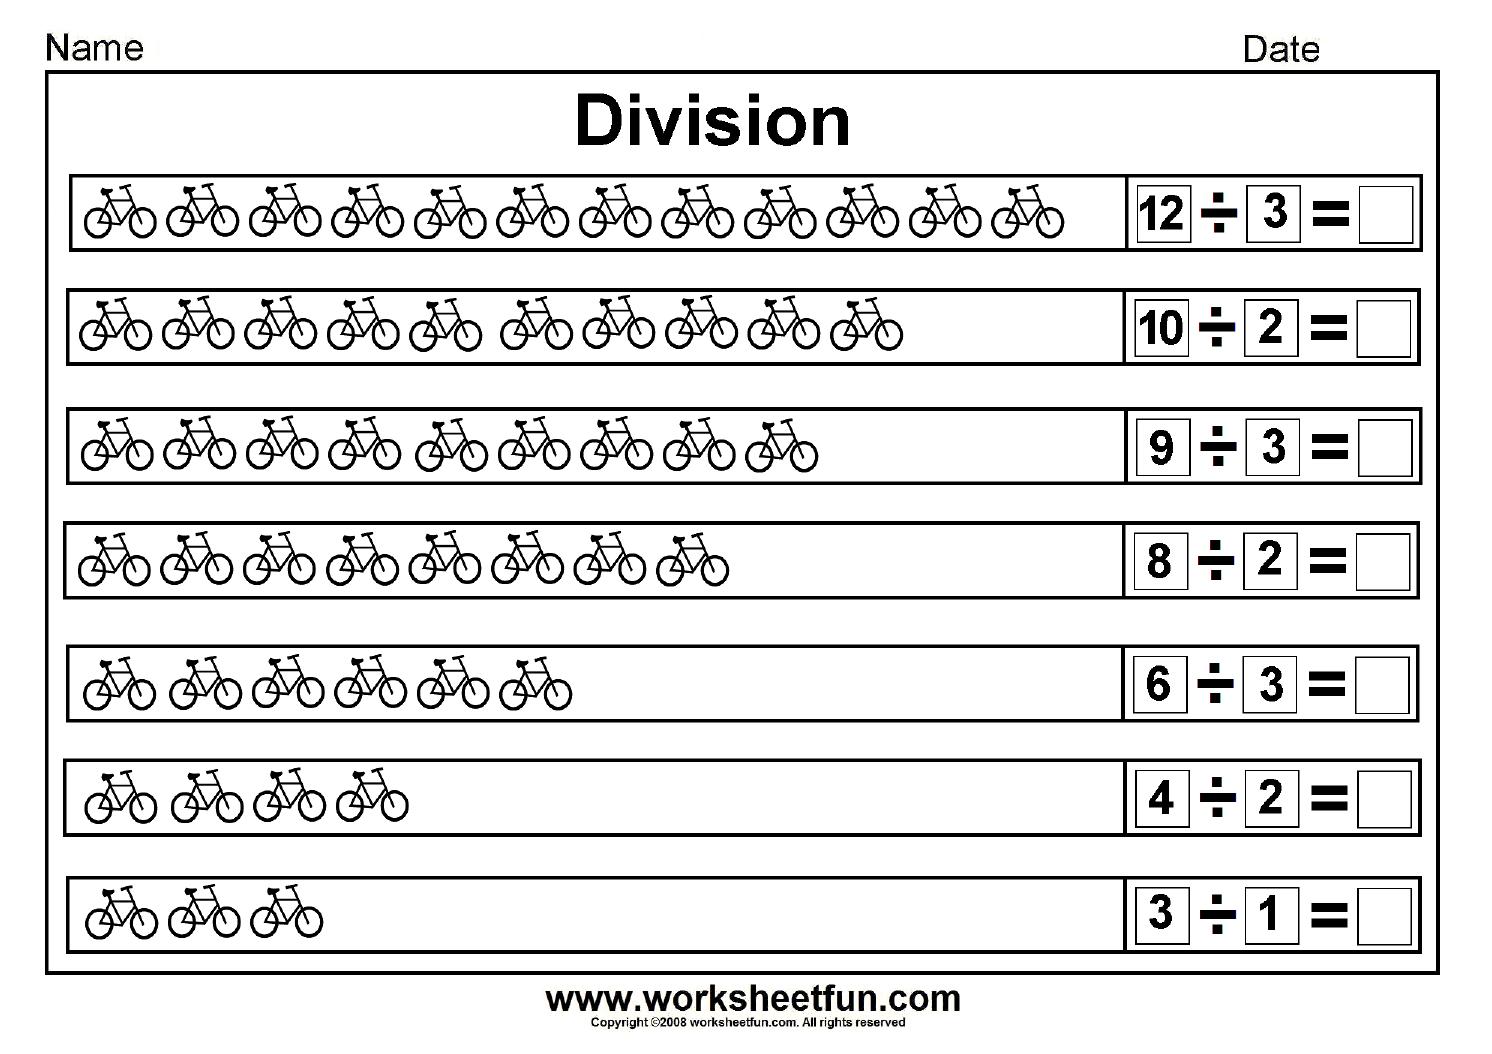 Division Worksheets Second Grade 544389